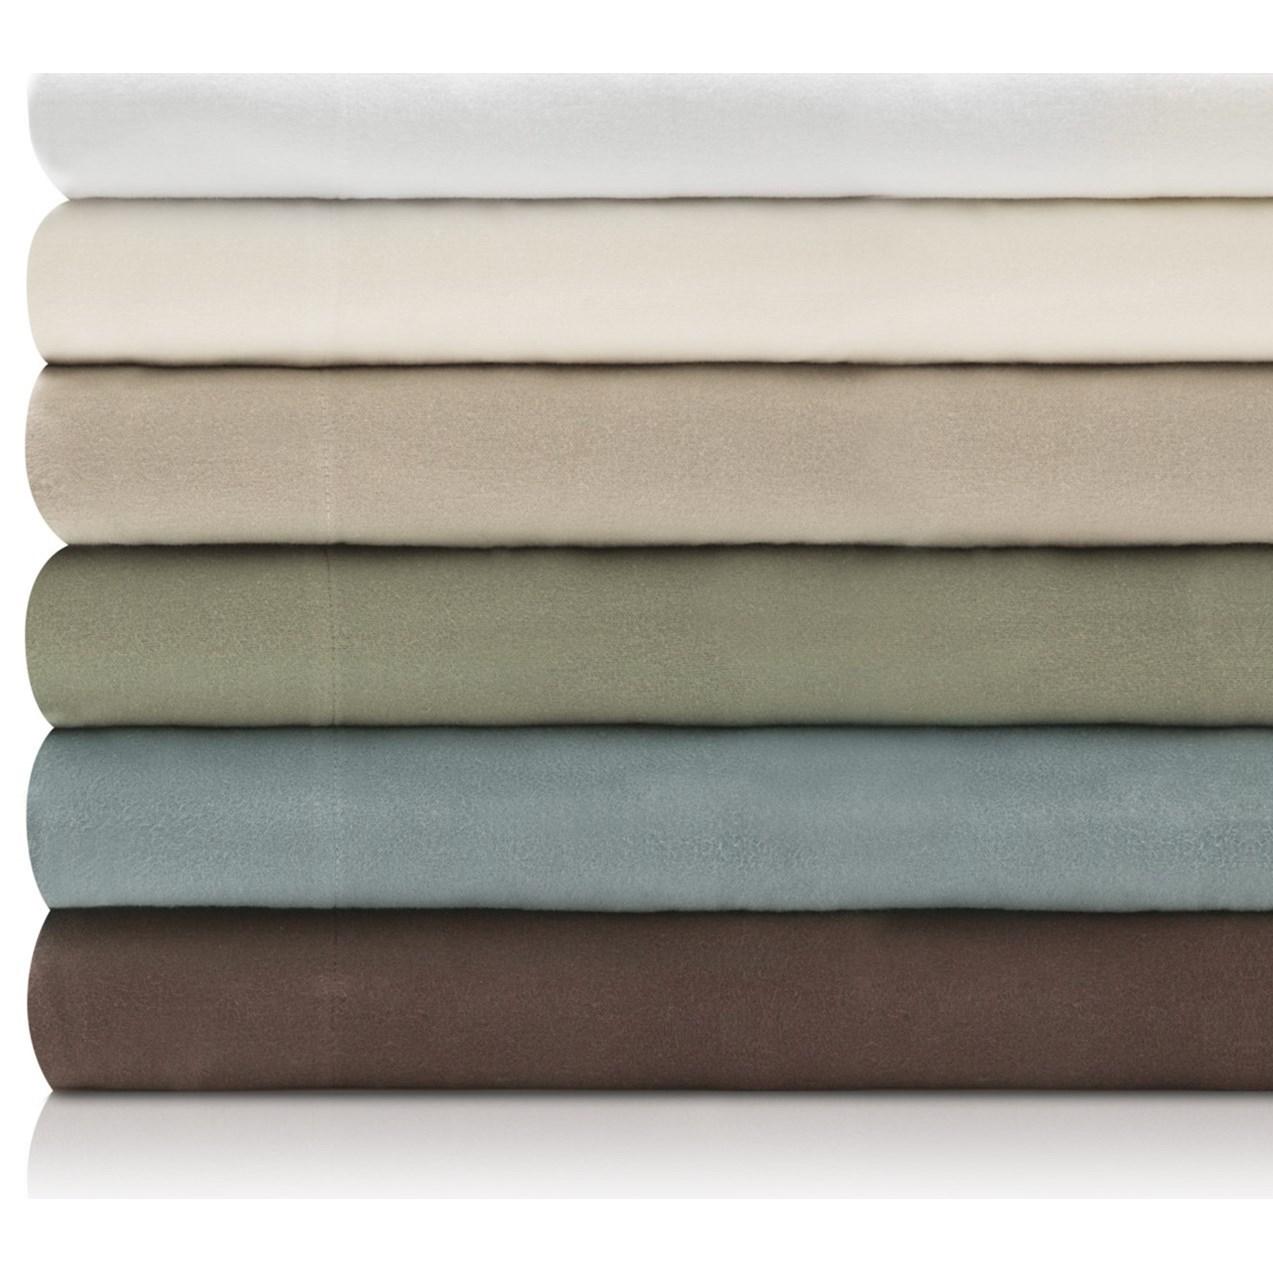 Malouf Portuguese Flannel Queen Woven™ Portuguese Flannel Pillowcases  - Item Number: WO19QQCOFC